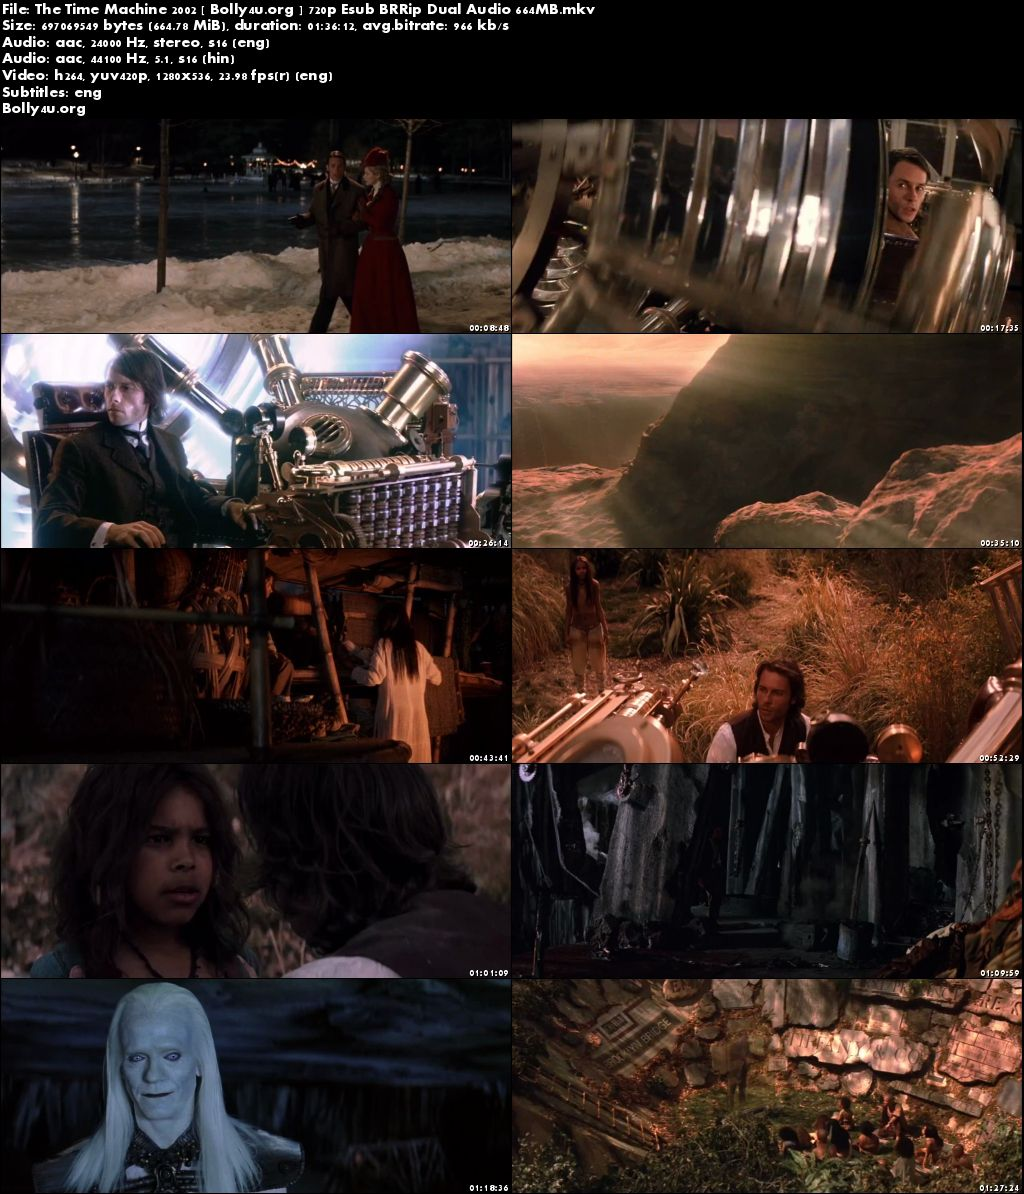 The Time Machine 2002 BluRay 650MB Hindi Dual Audio 720p Download